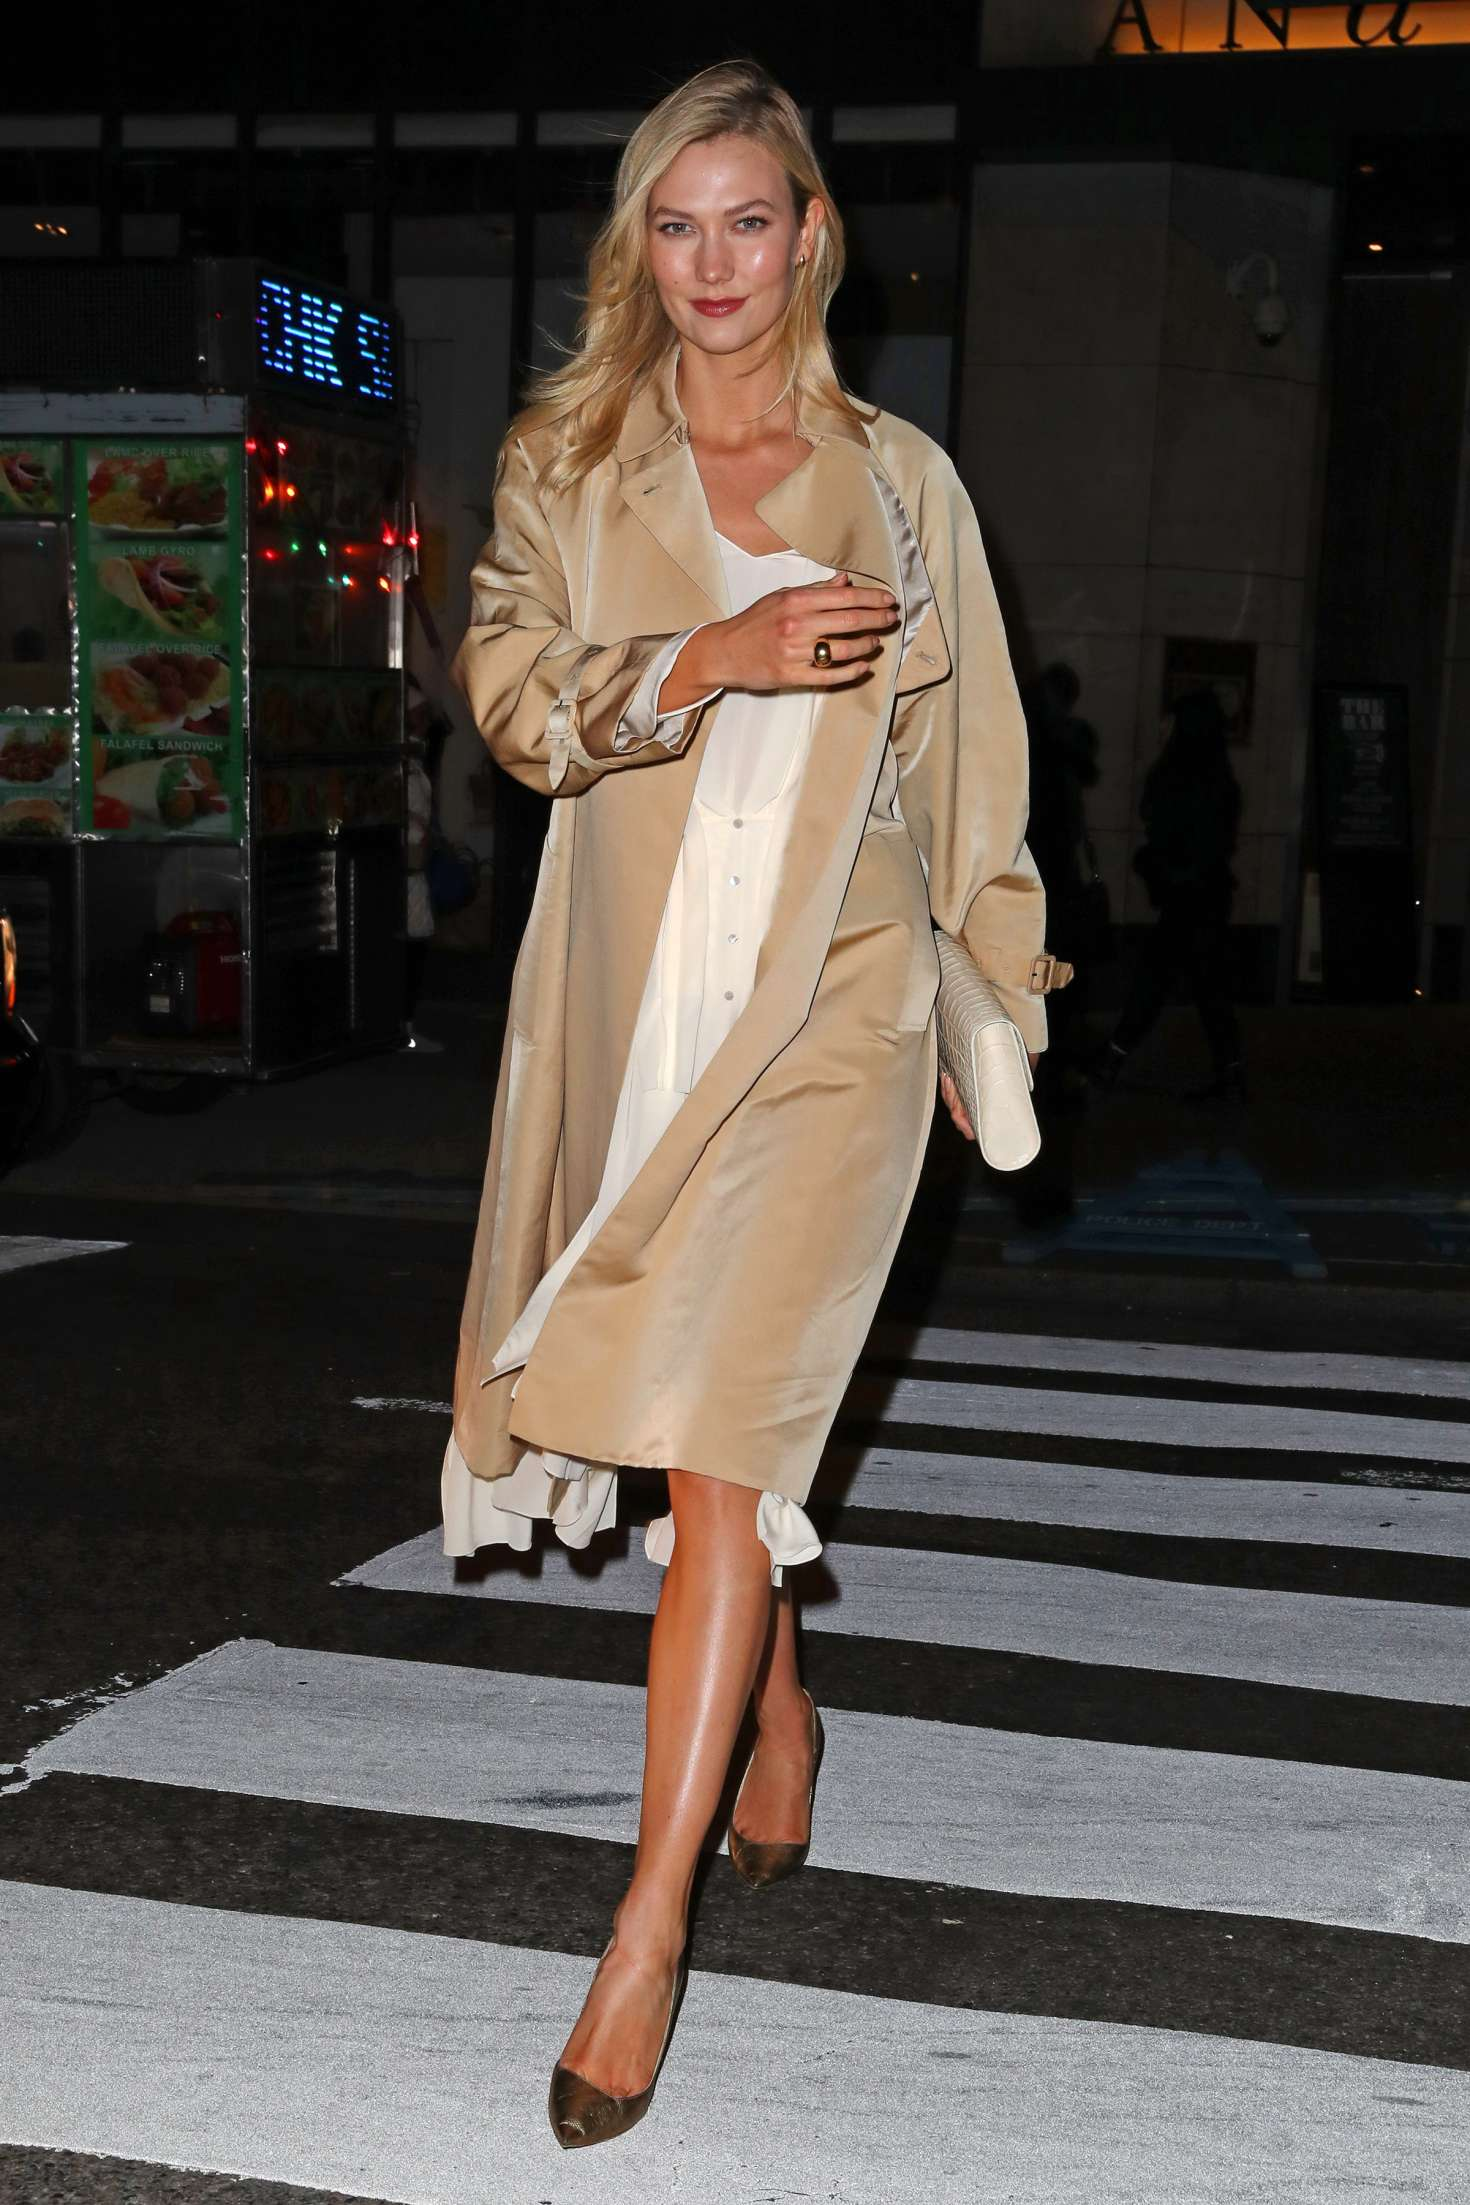 Karlie Kloss 2018 : Karlie Kloss: Night out in New York -01